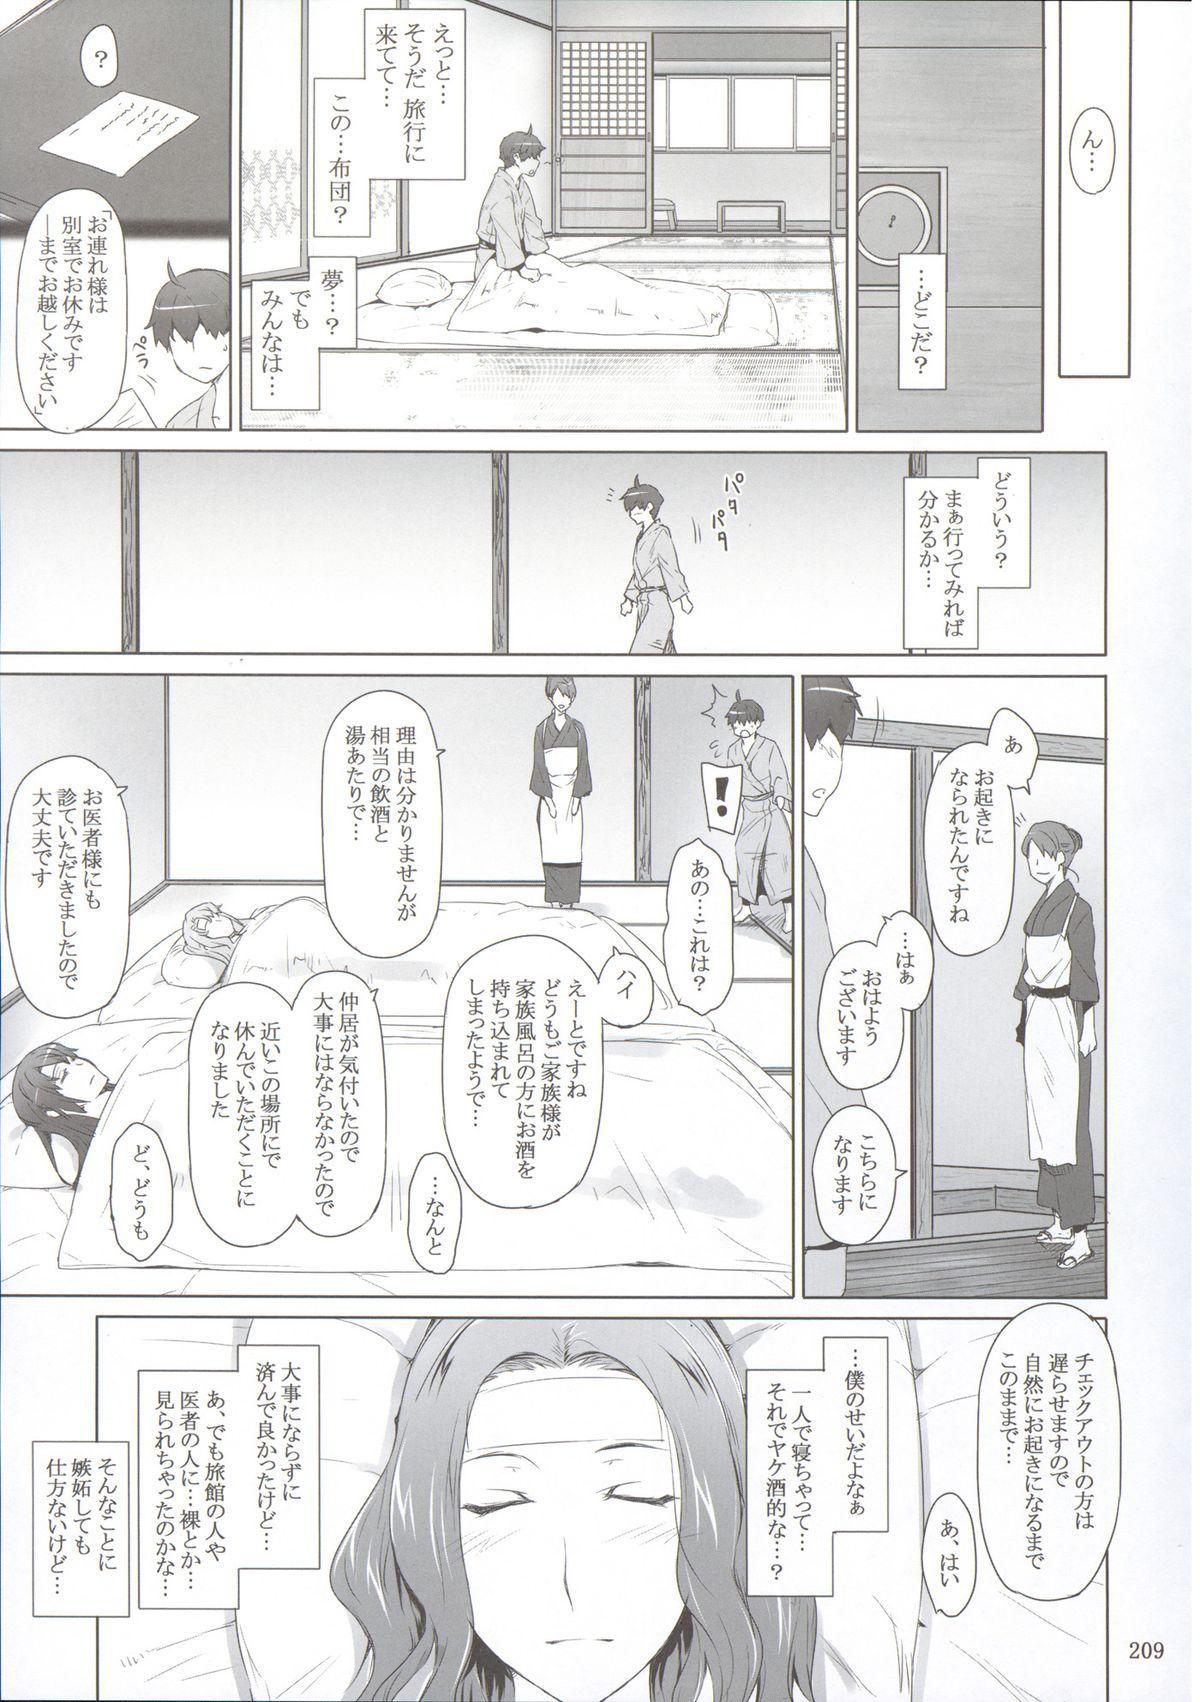 (C86) [MTSP (Jin)] Tachibana-san-chi no Dansei Jijou Matome Ban [Incomplete] 7